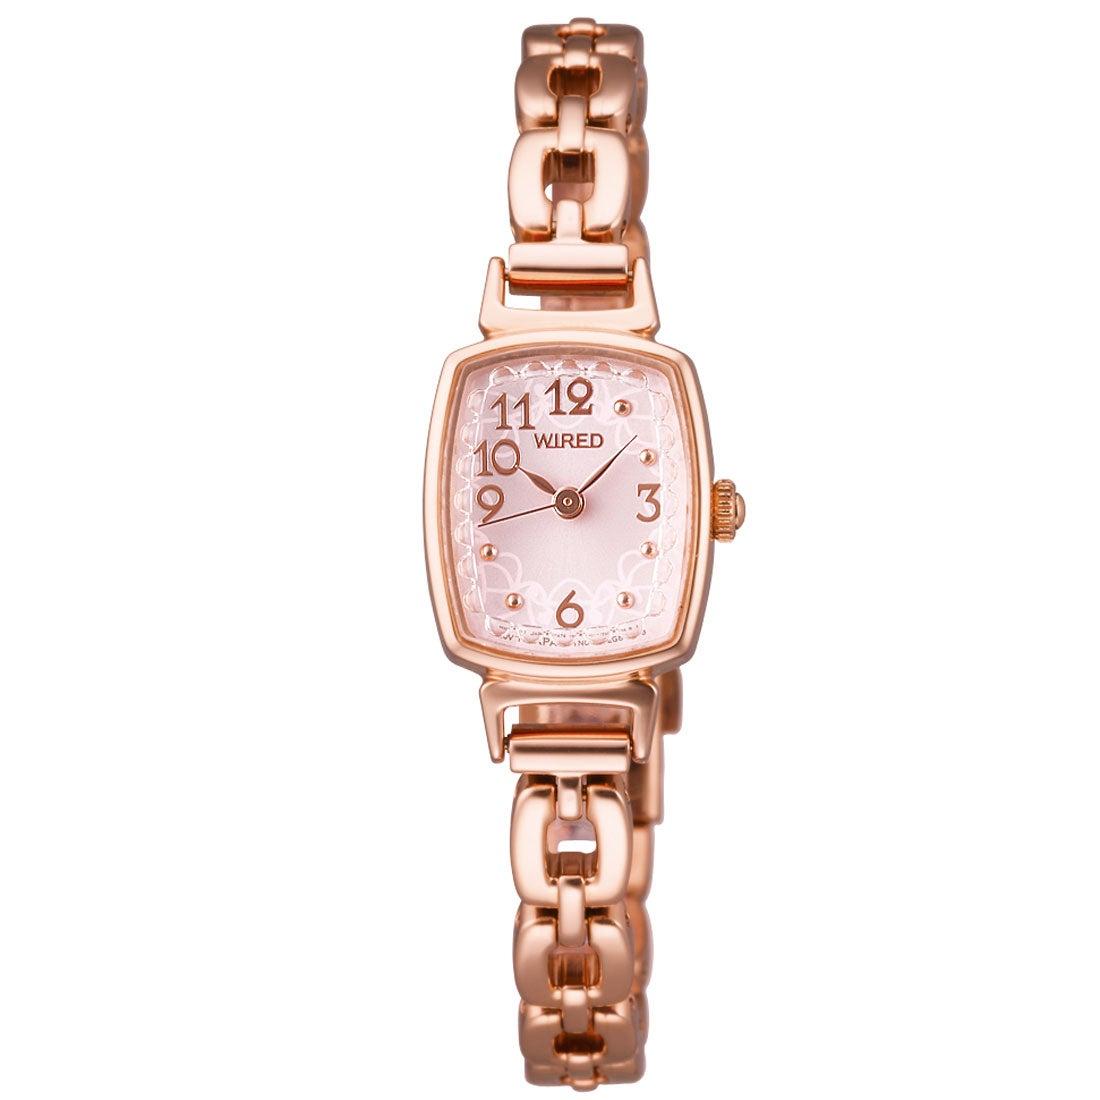 640f2d0120 SEIKO ワイアード WIRED f(エフ) トリンドル玲奈着用モデル 腕時計 国産 レディース(シルバー) -靴&ファッション通販  ロコンド〜自宅で試着、気軽に返品